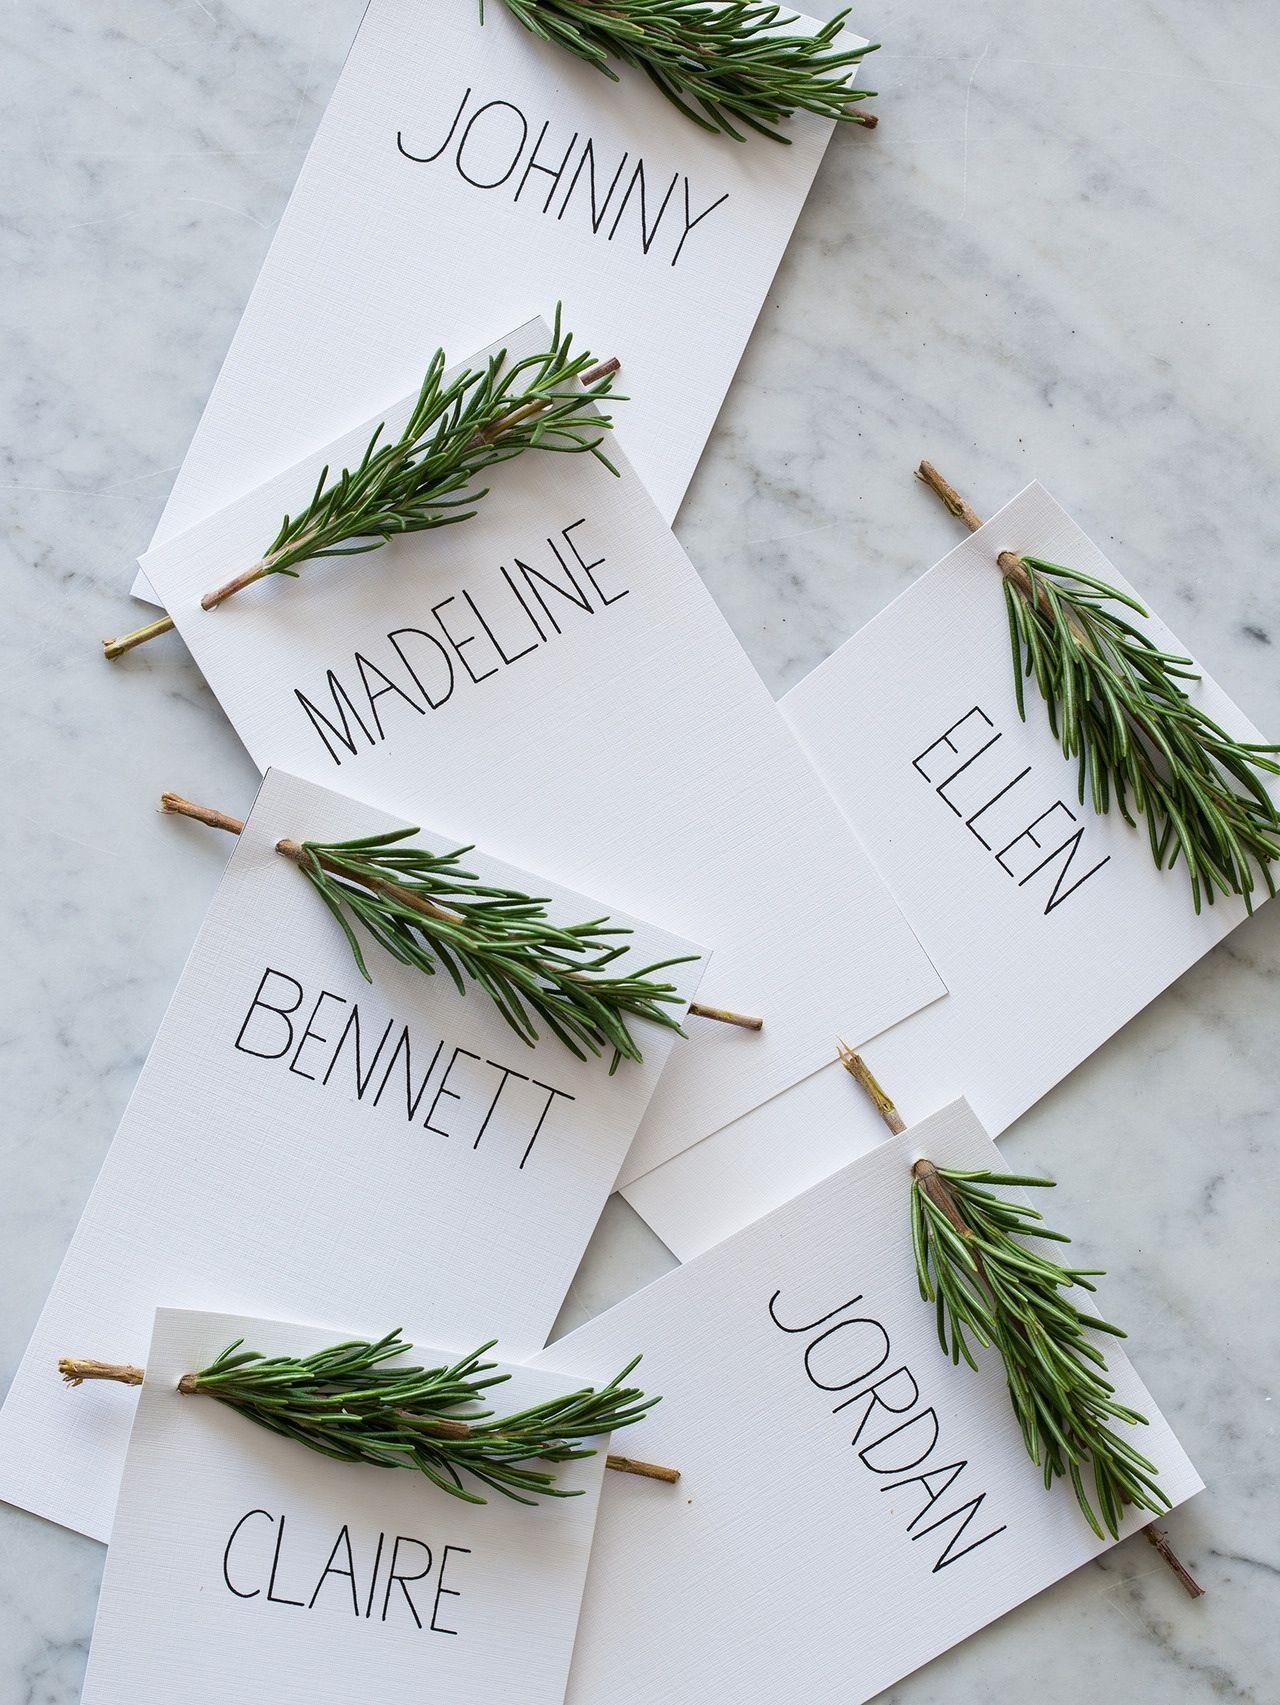 21 Winter Decor Ideas That Don\'t Scream Christmas | Reception Tables ...